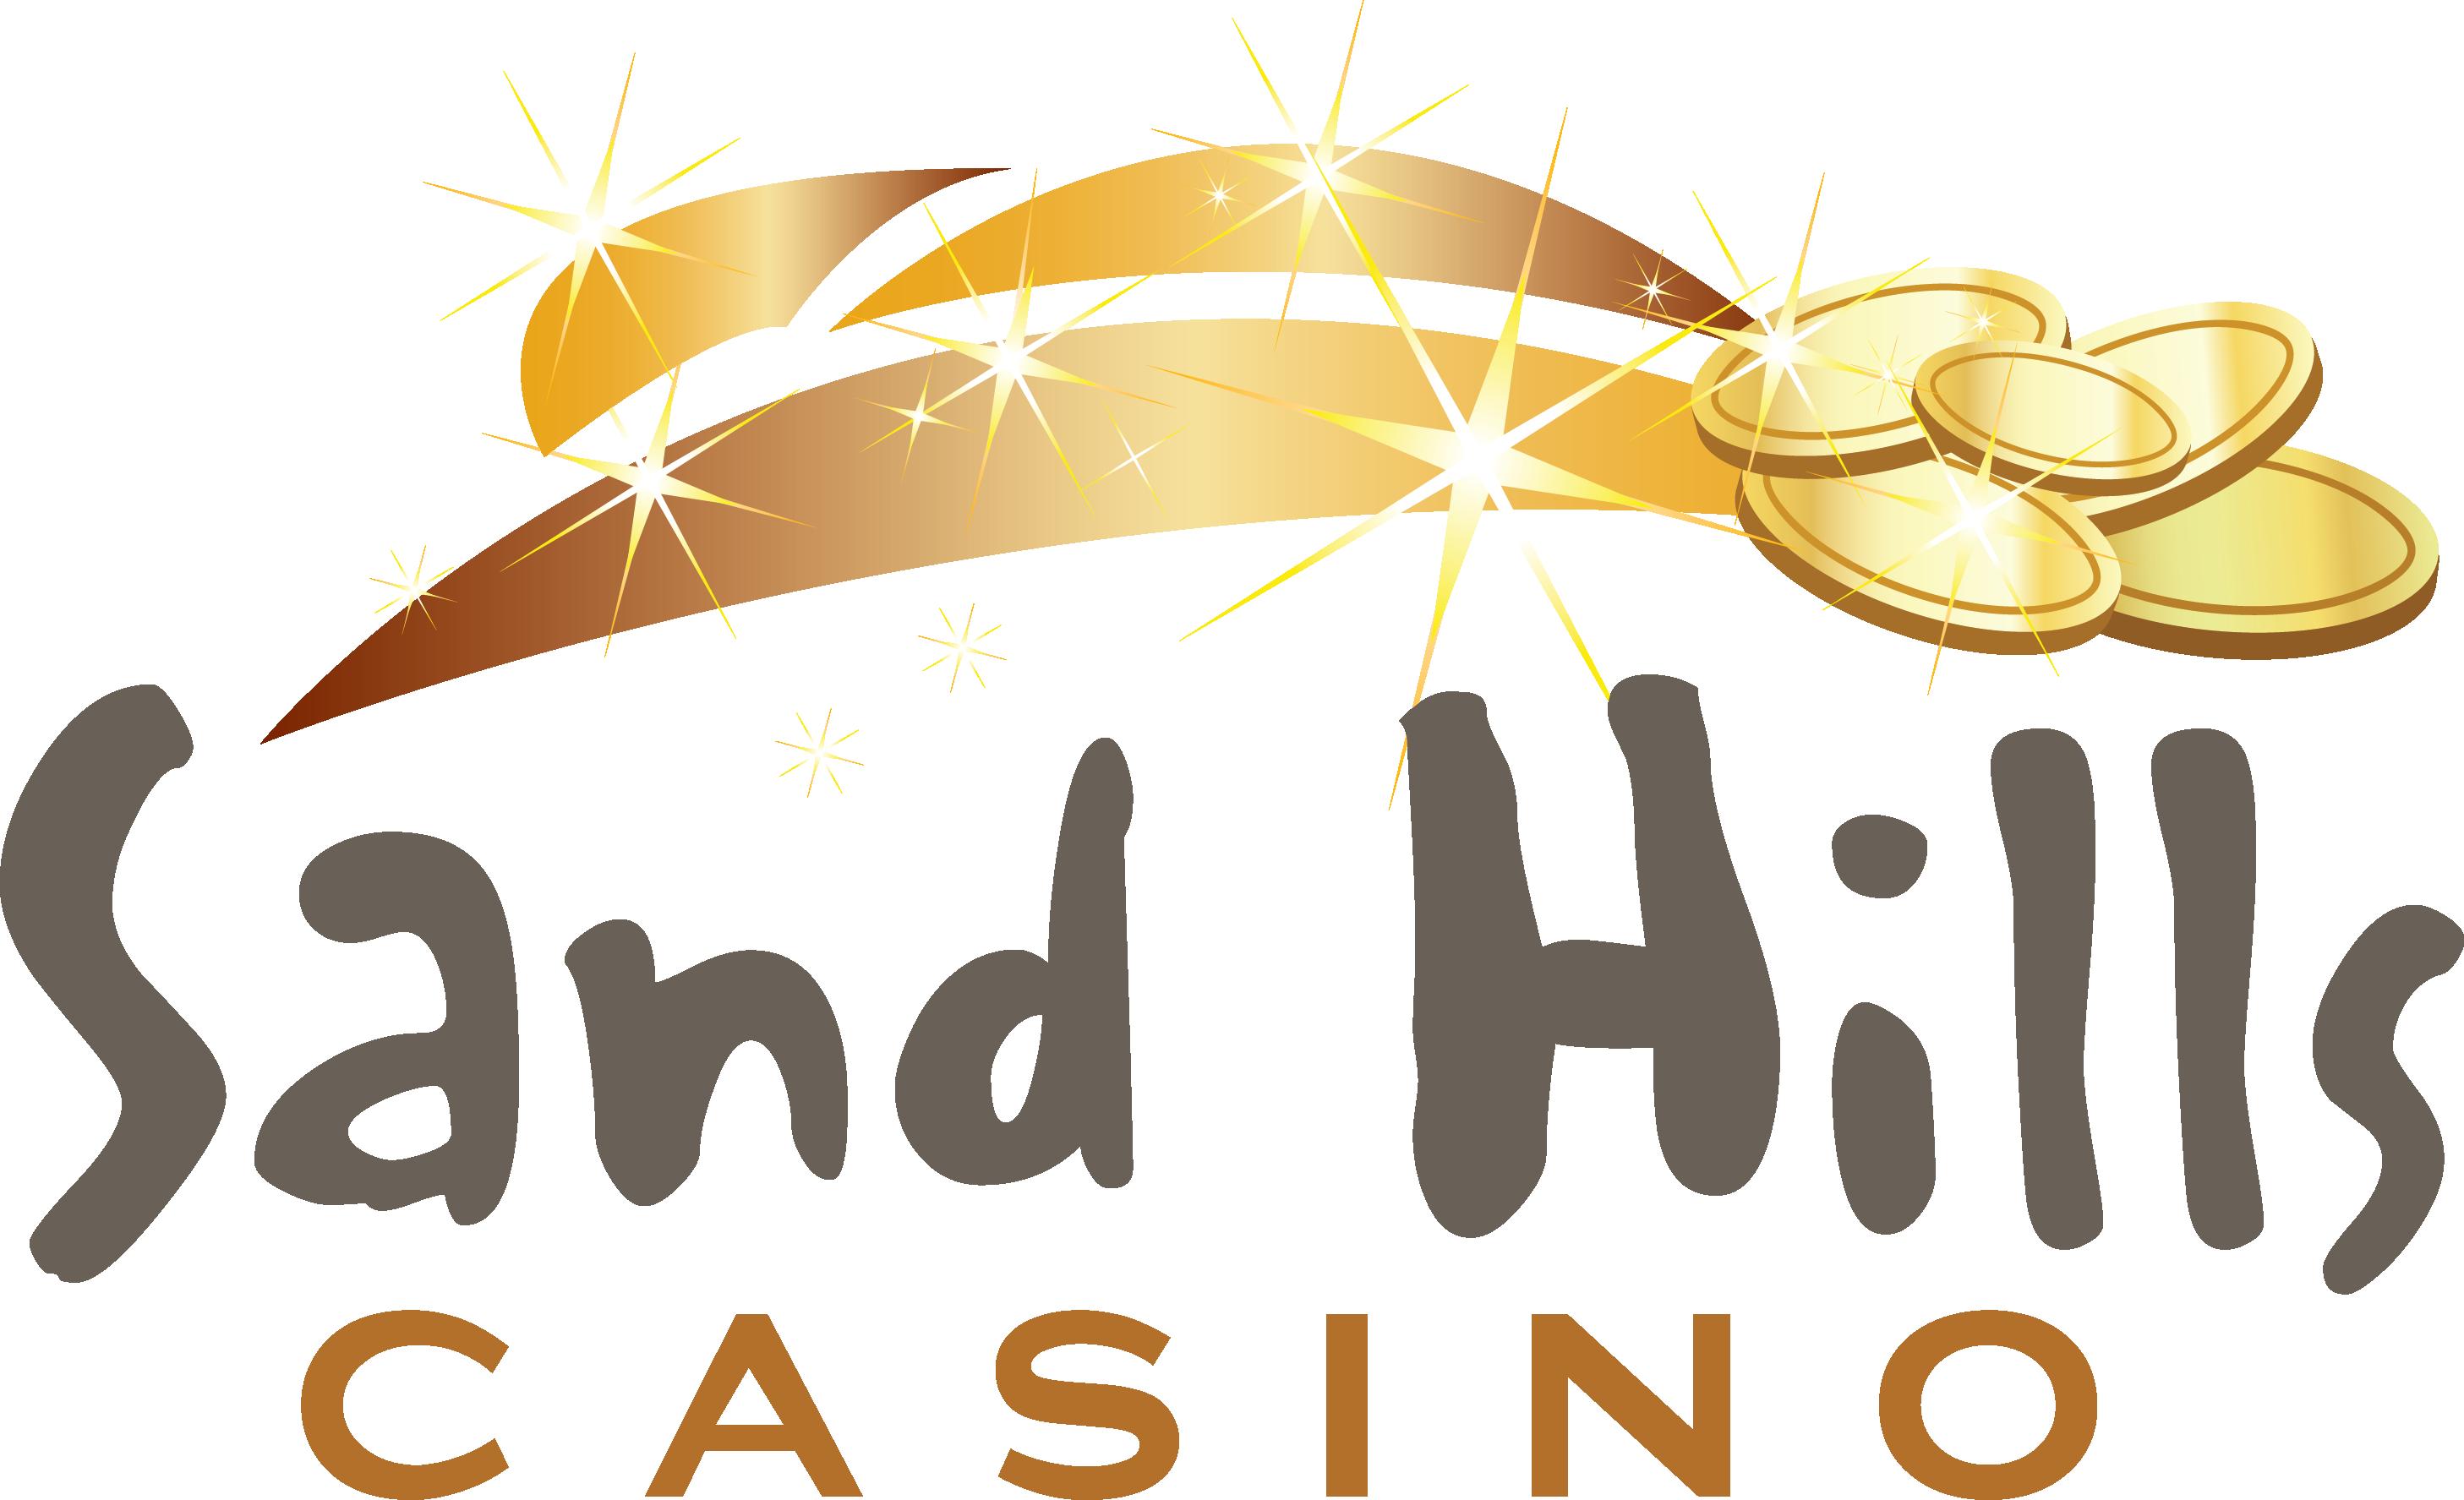 Hills casino carberry manitoba. Desert clipart sand hill